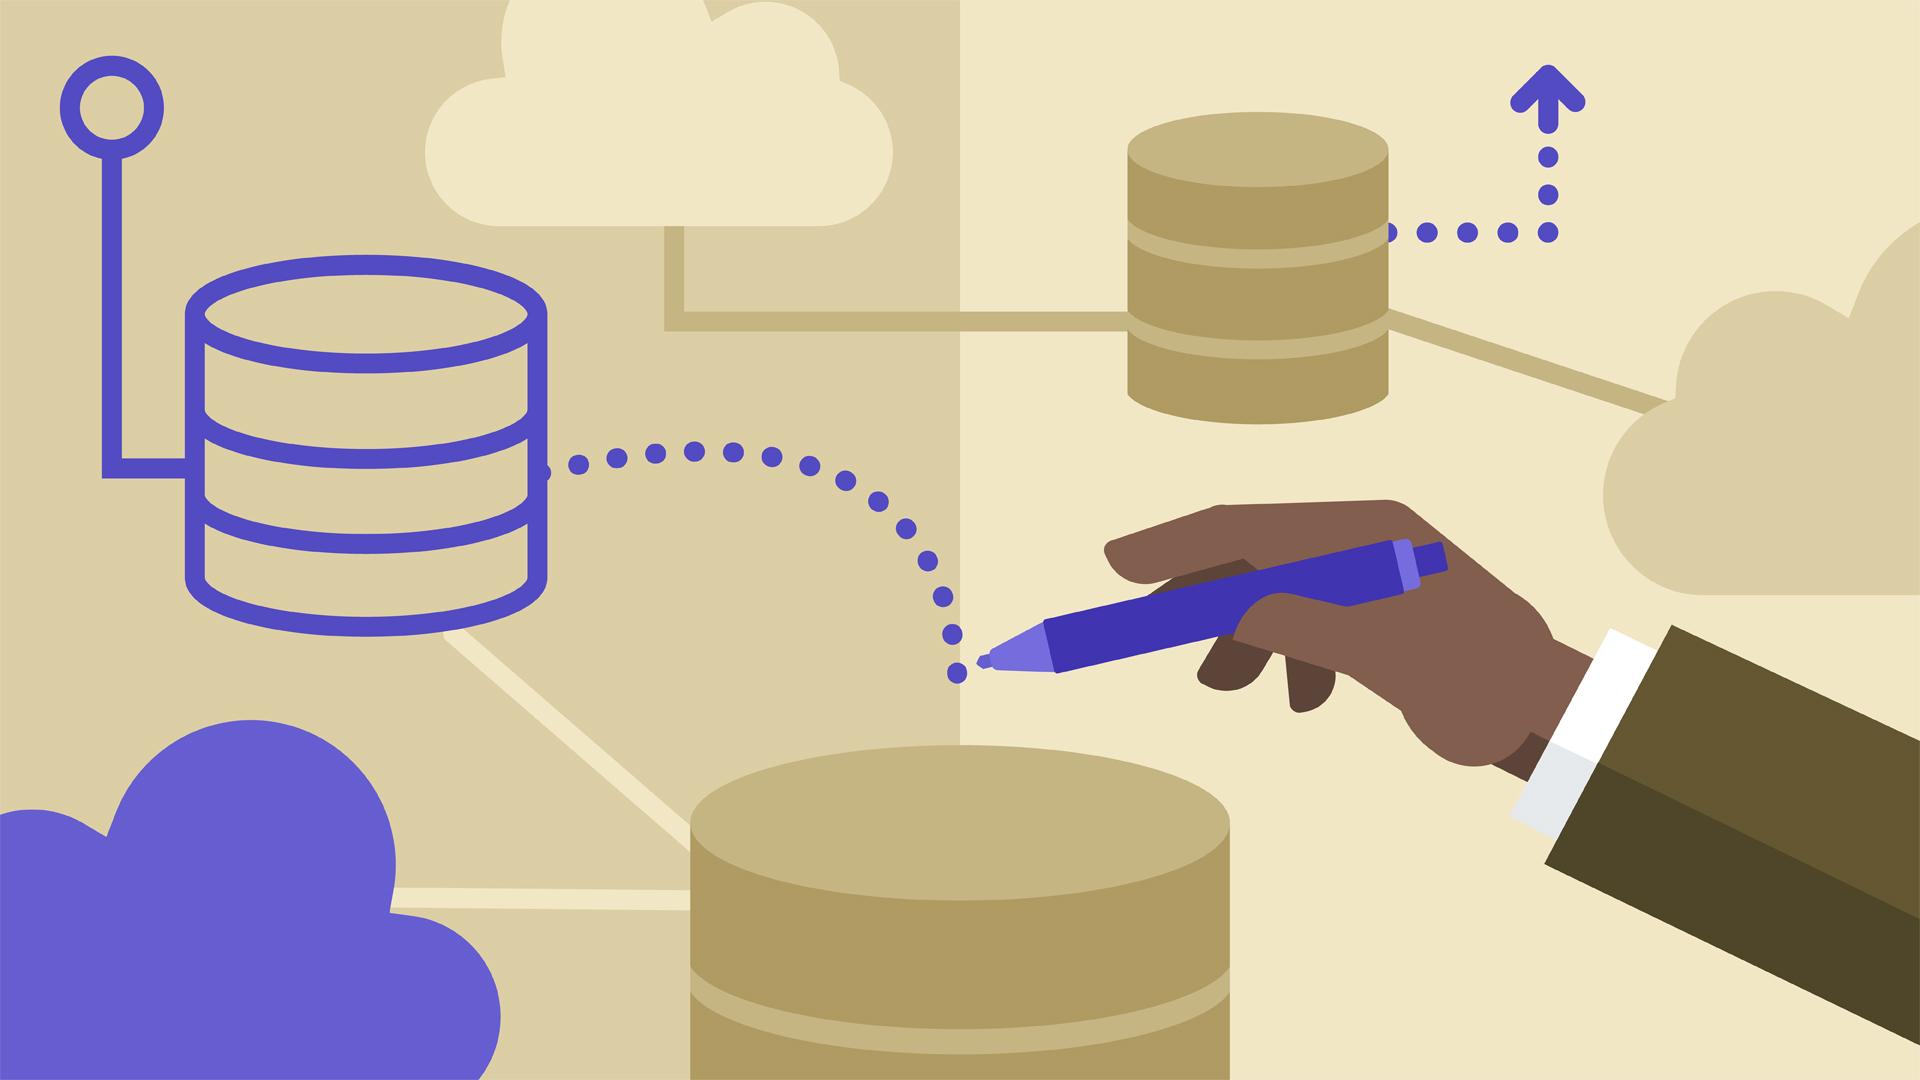 [Lynda] Microsoft Azure: Design an Application Storage and Data Access Strategy